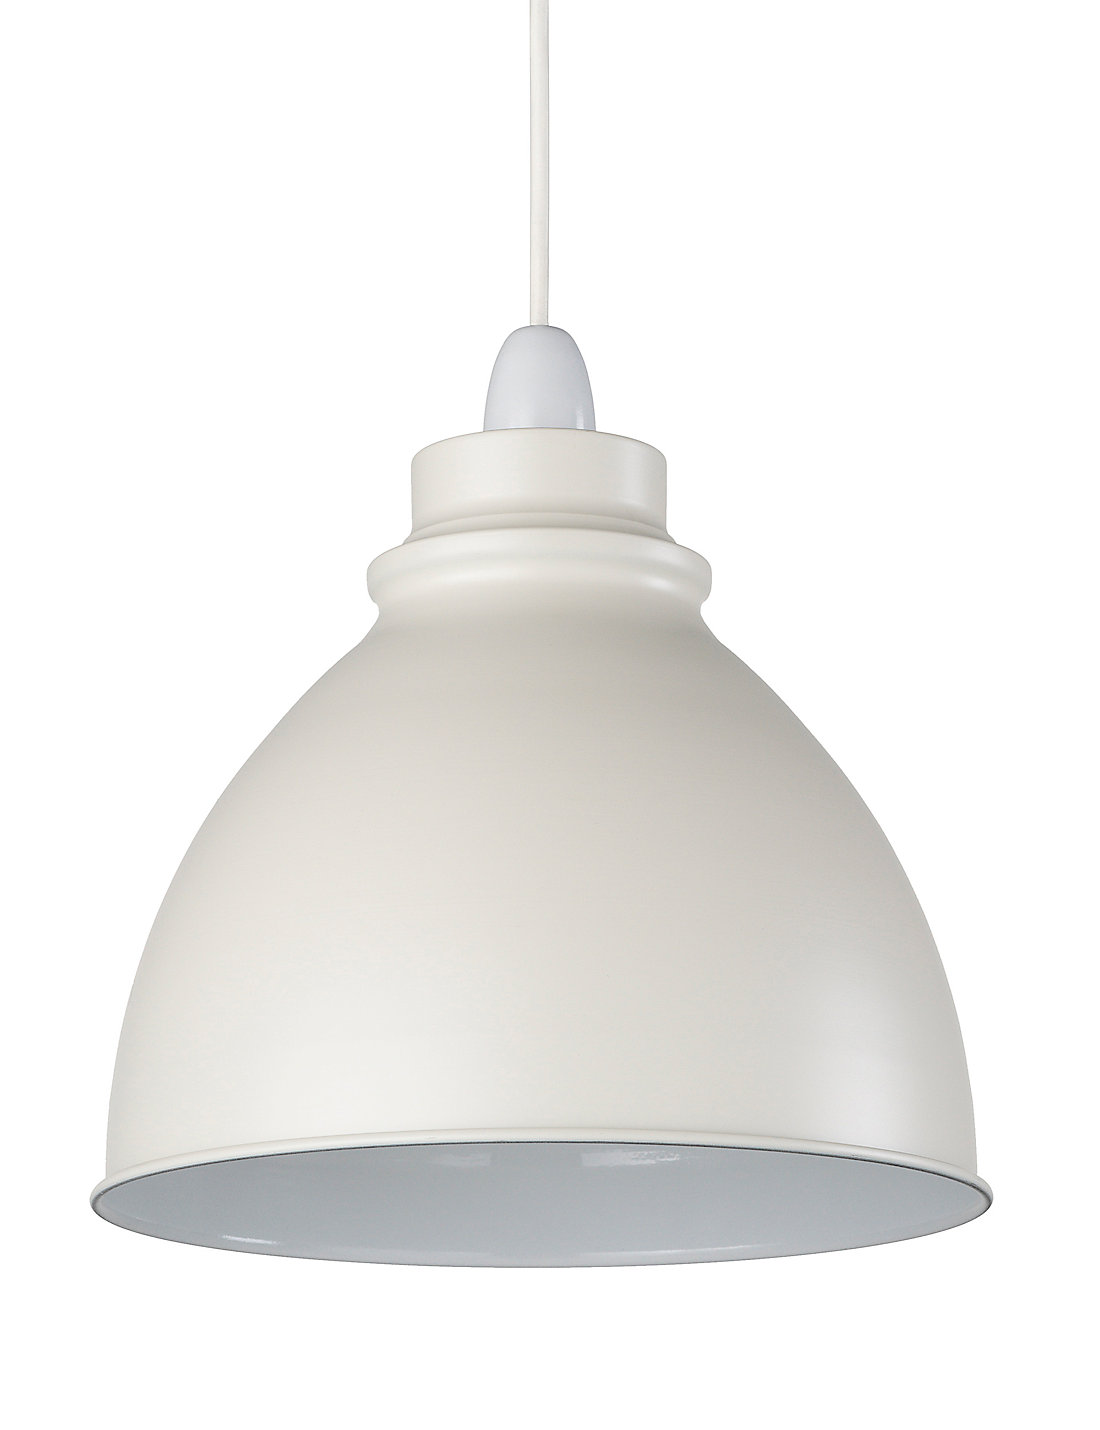 Retro Small Ceiling Lamp Shade